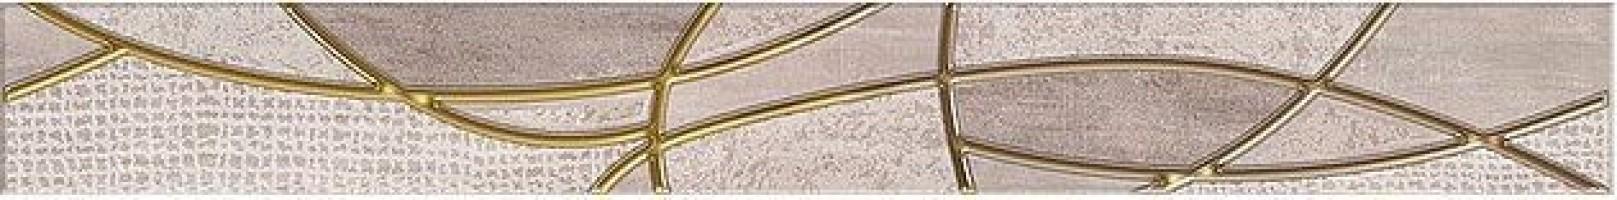 Бордюр Pandora Latte Charm 7.5х63 Azori